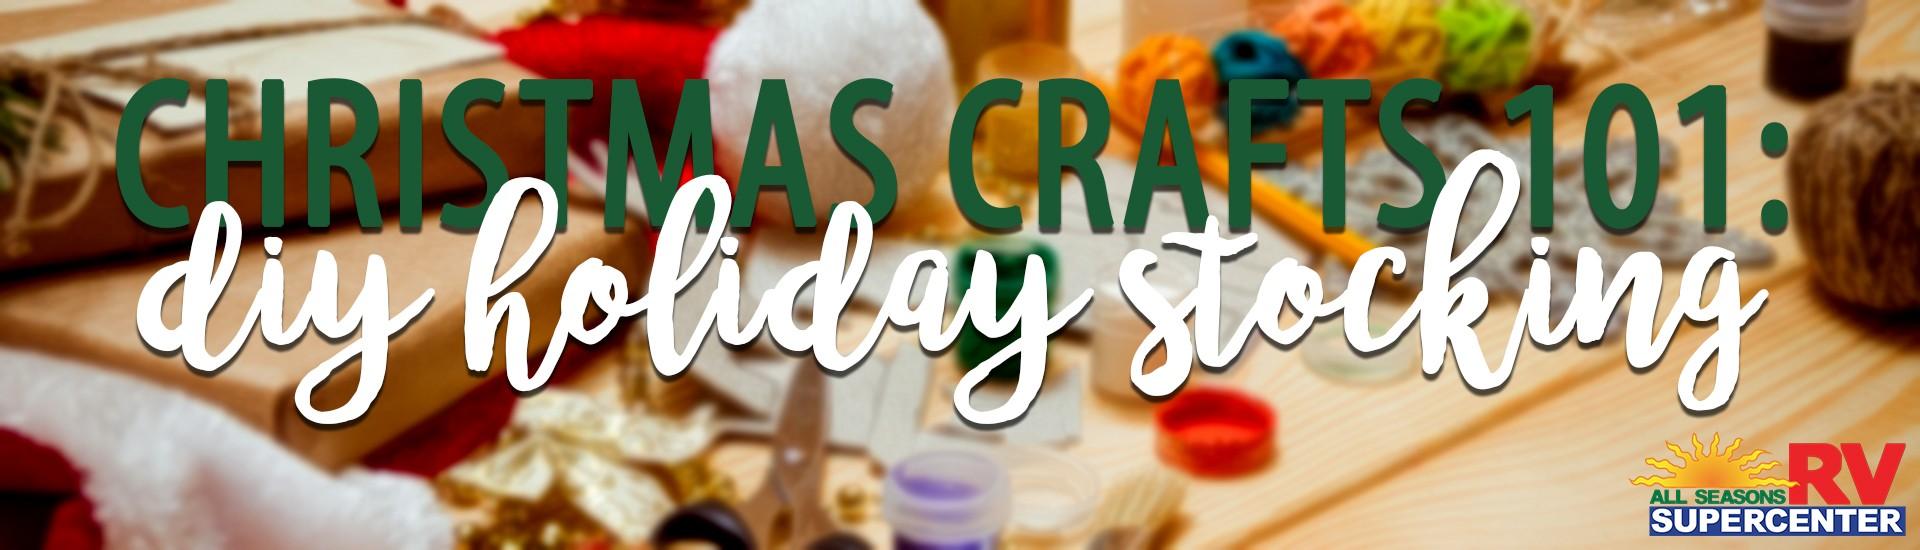 christmas crafts 101 diy holiday stocking